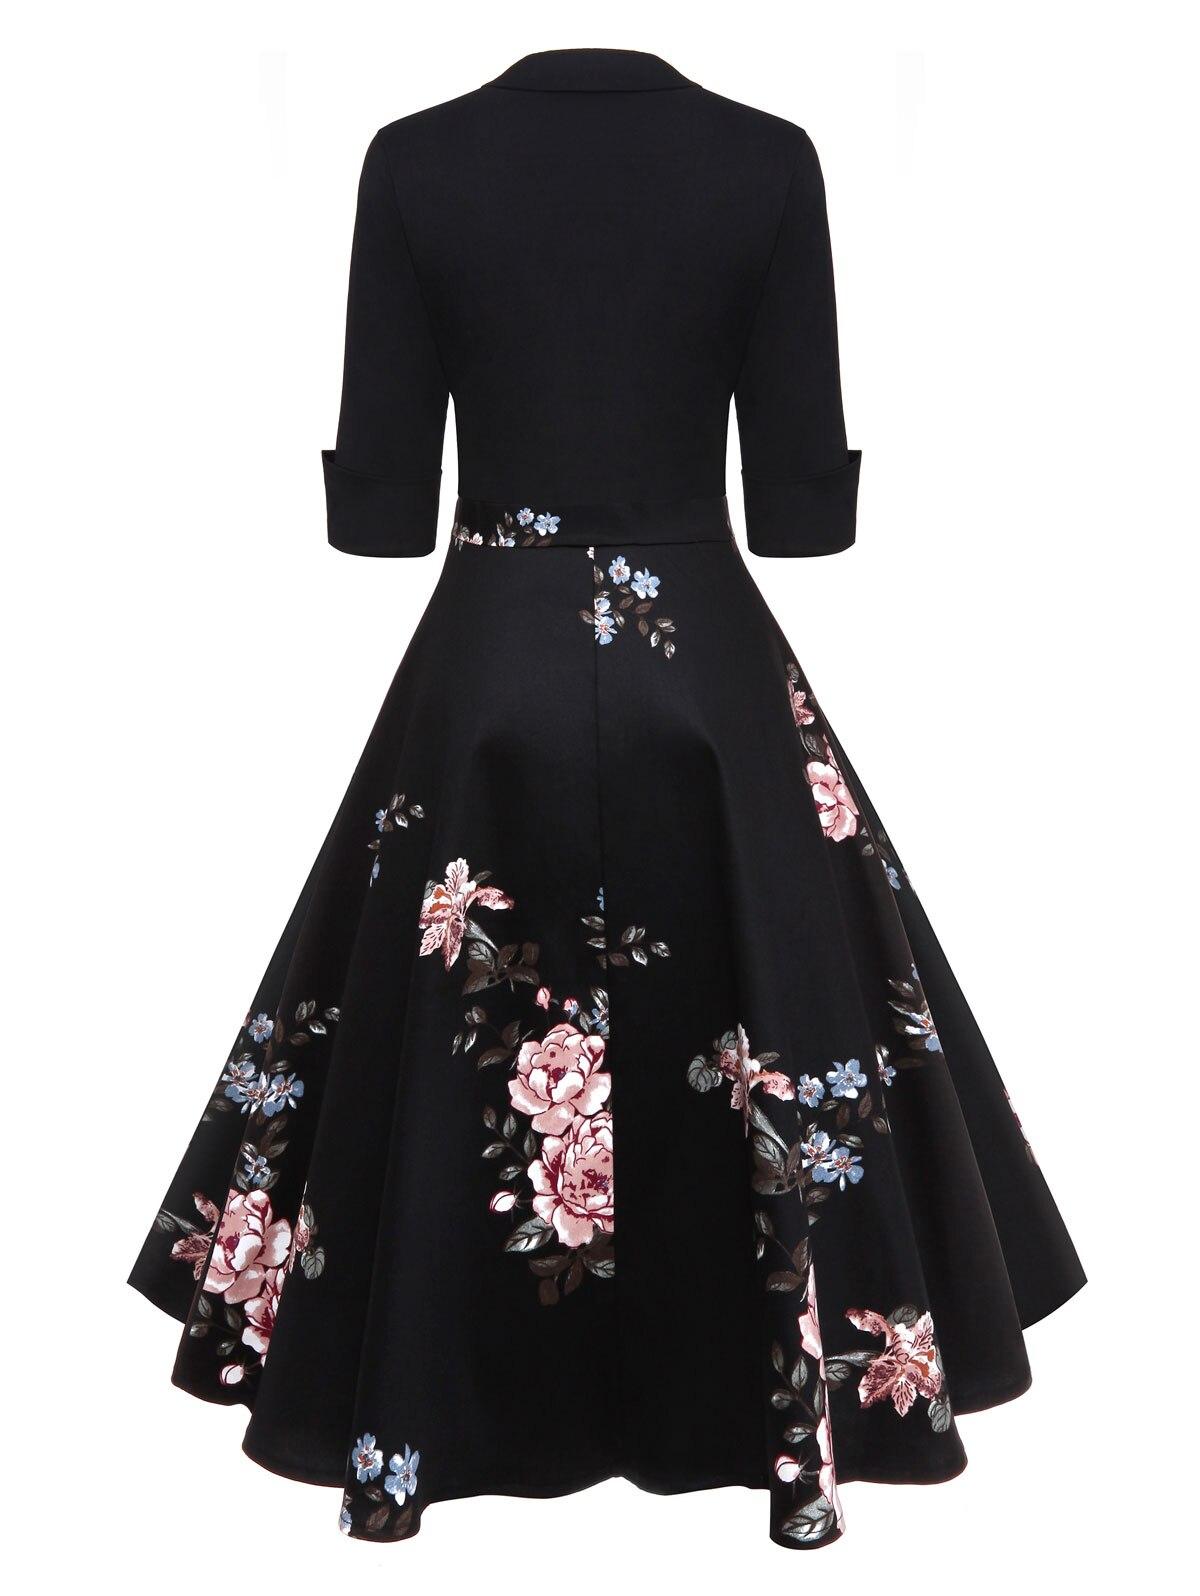 AZULINA Audrey Hepburn Vintage Party Dress Women Floral Flare Midi ... 5522ab48e404